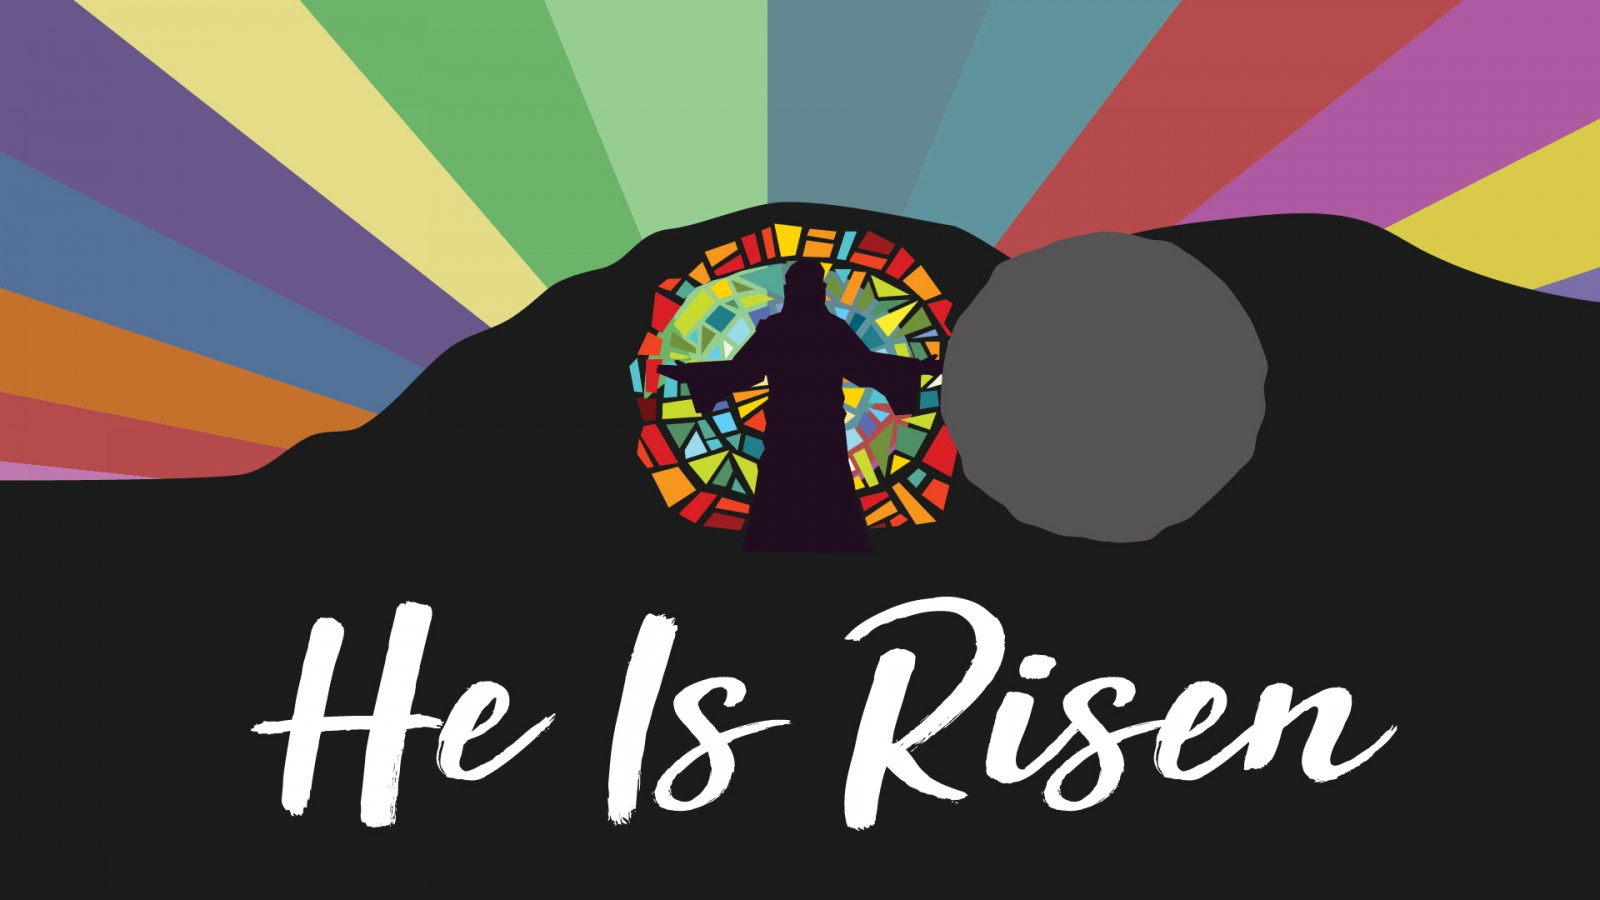 He is risen stone